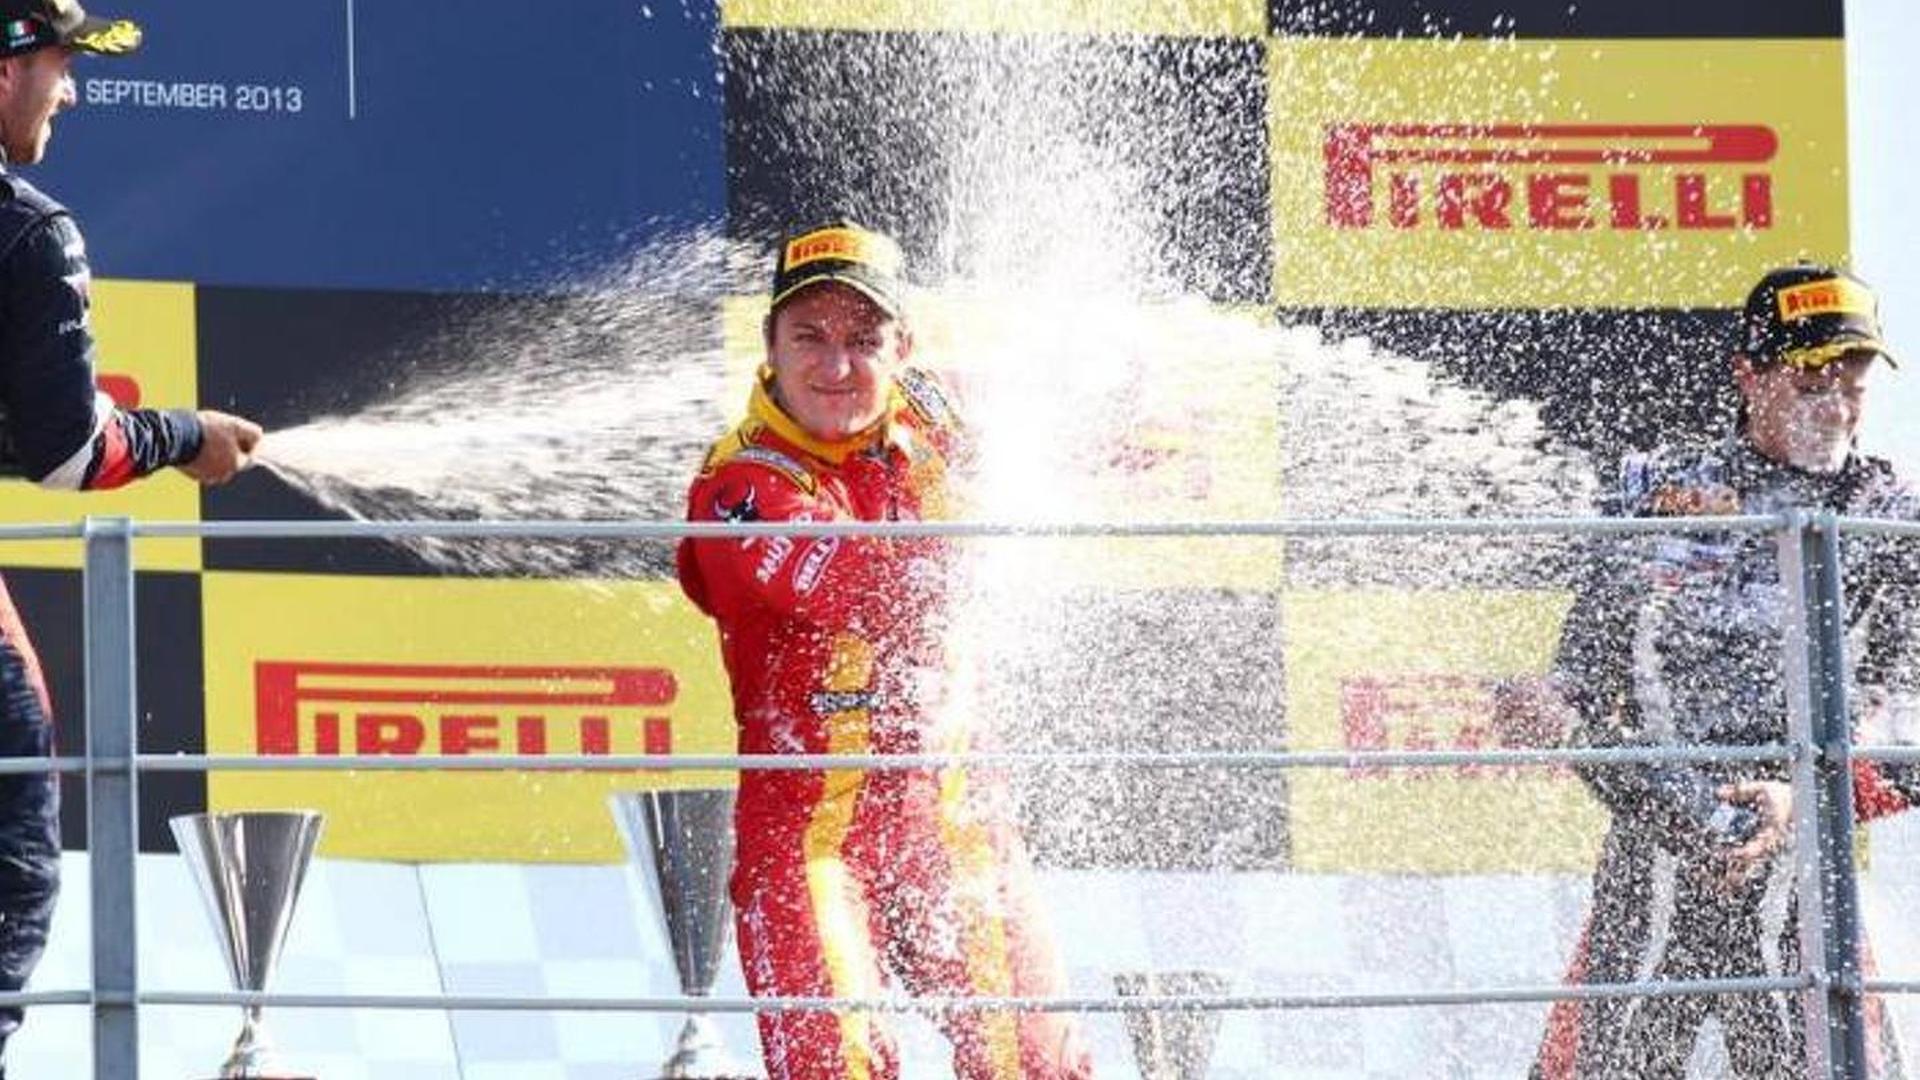 Sauber turned down GP2 champion's $14m - report